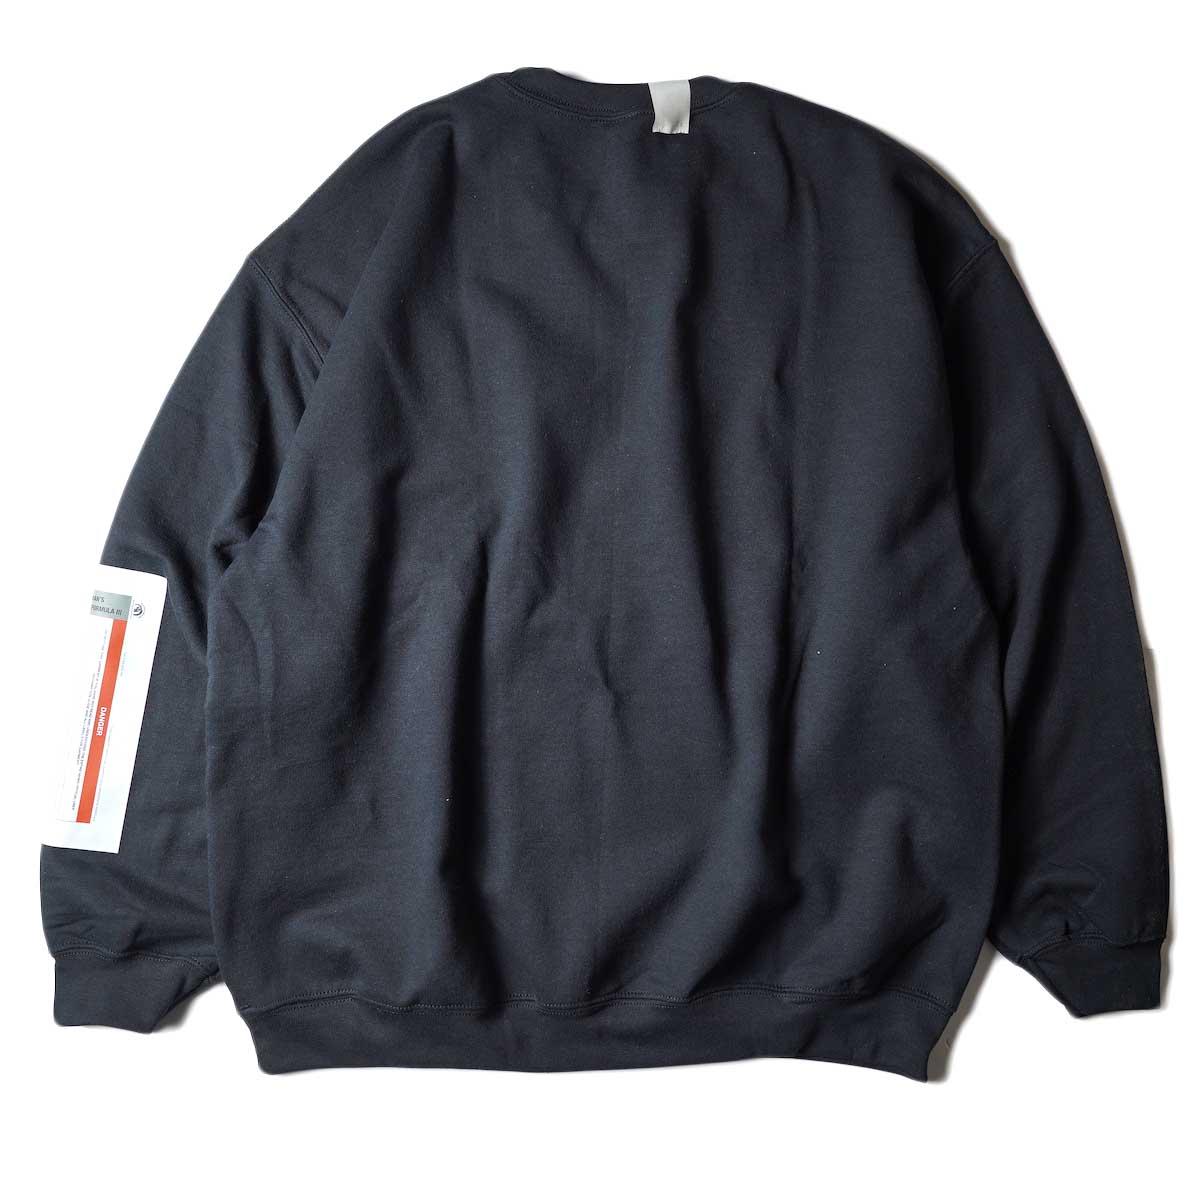 N.HOOLYWOOD / 9212-CS85 Crew Neck Sweat Shirt (Black)背面